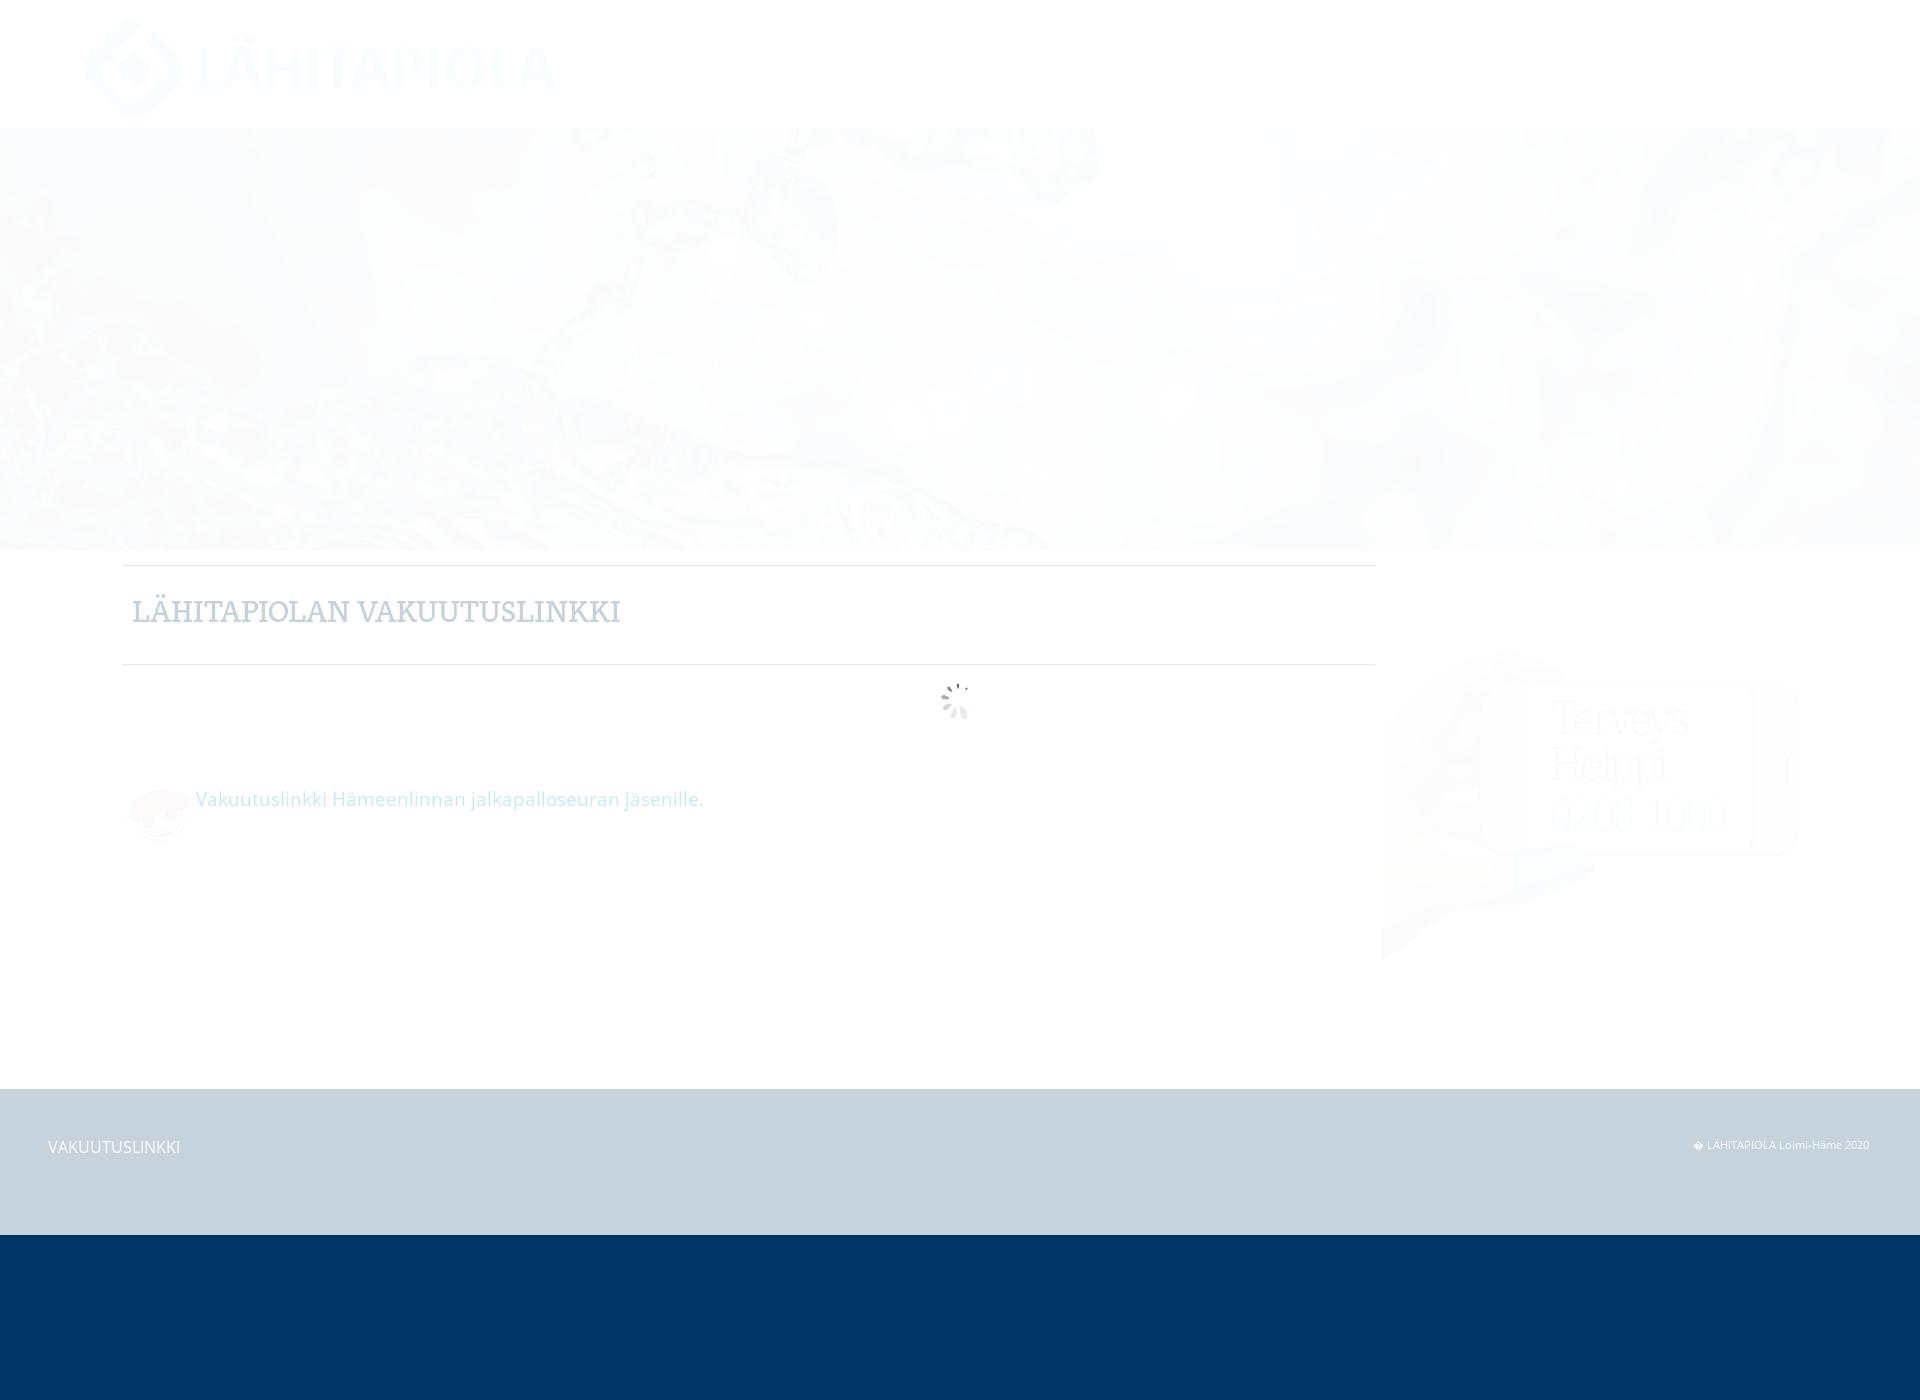 Screenshot for vakuutuslinkki.fi